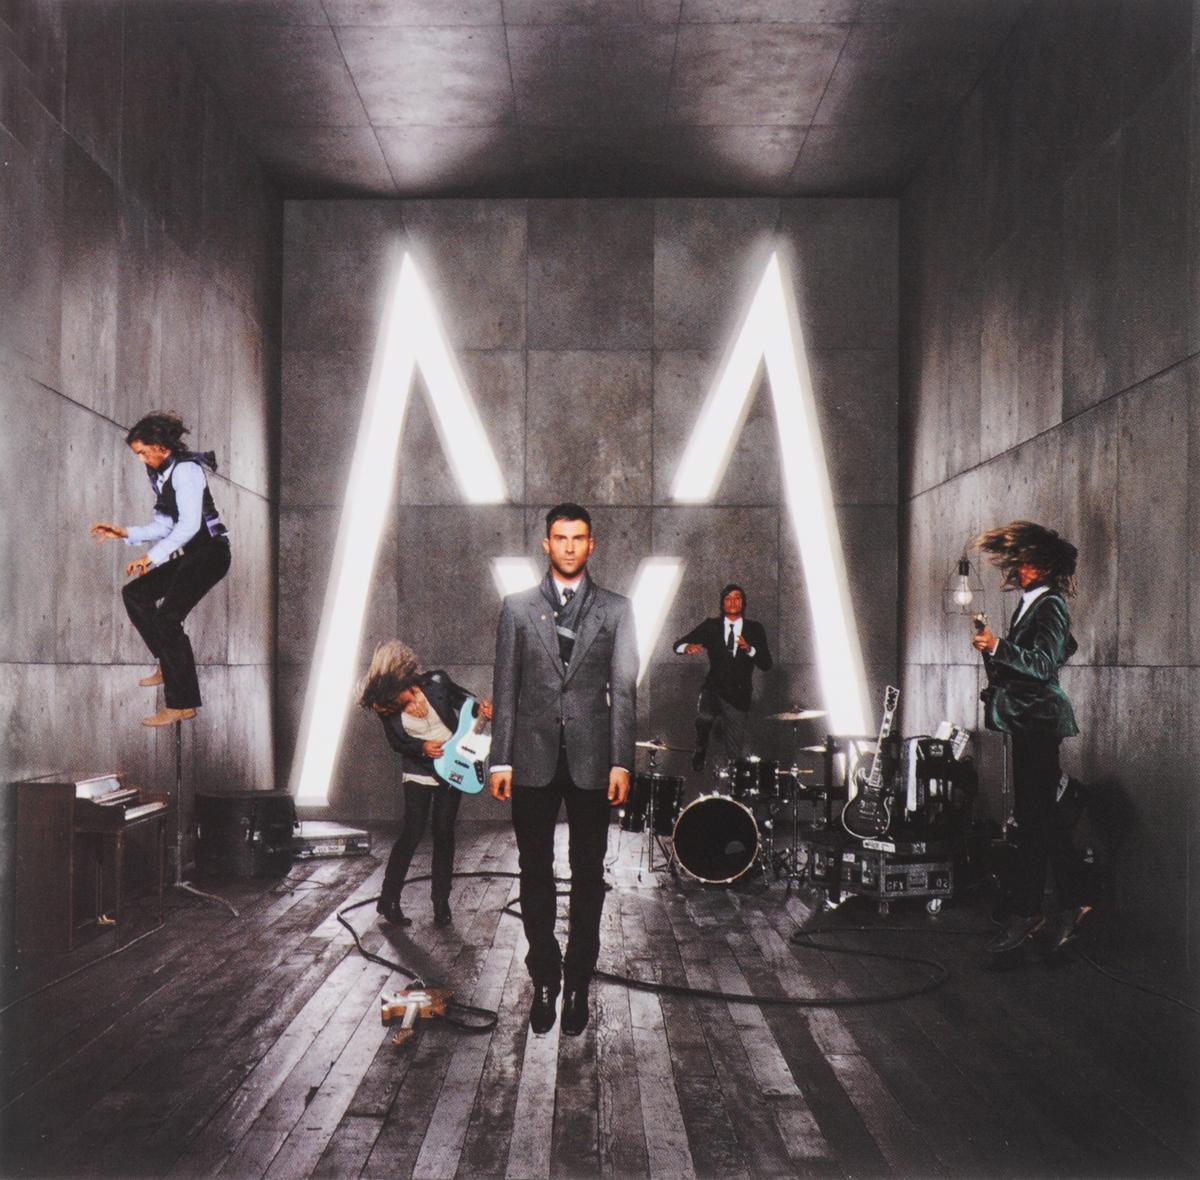 Maroon 5 5. It Wont Be Soon Before Long